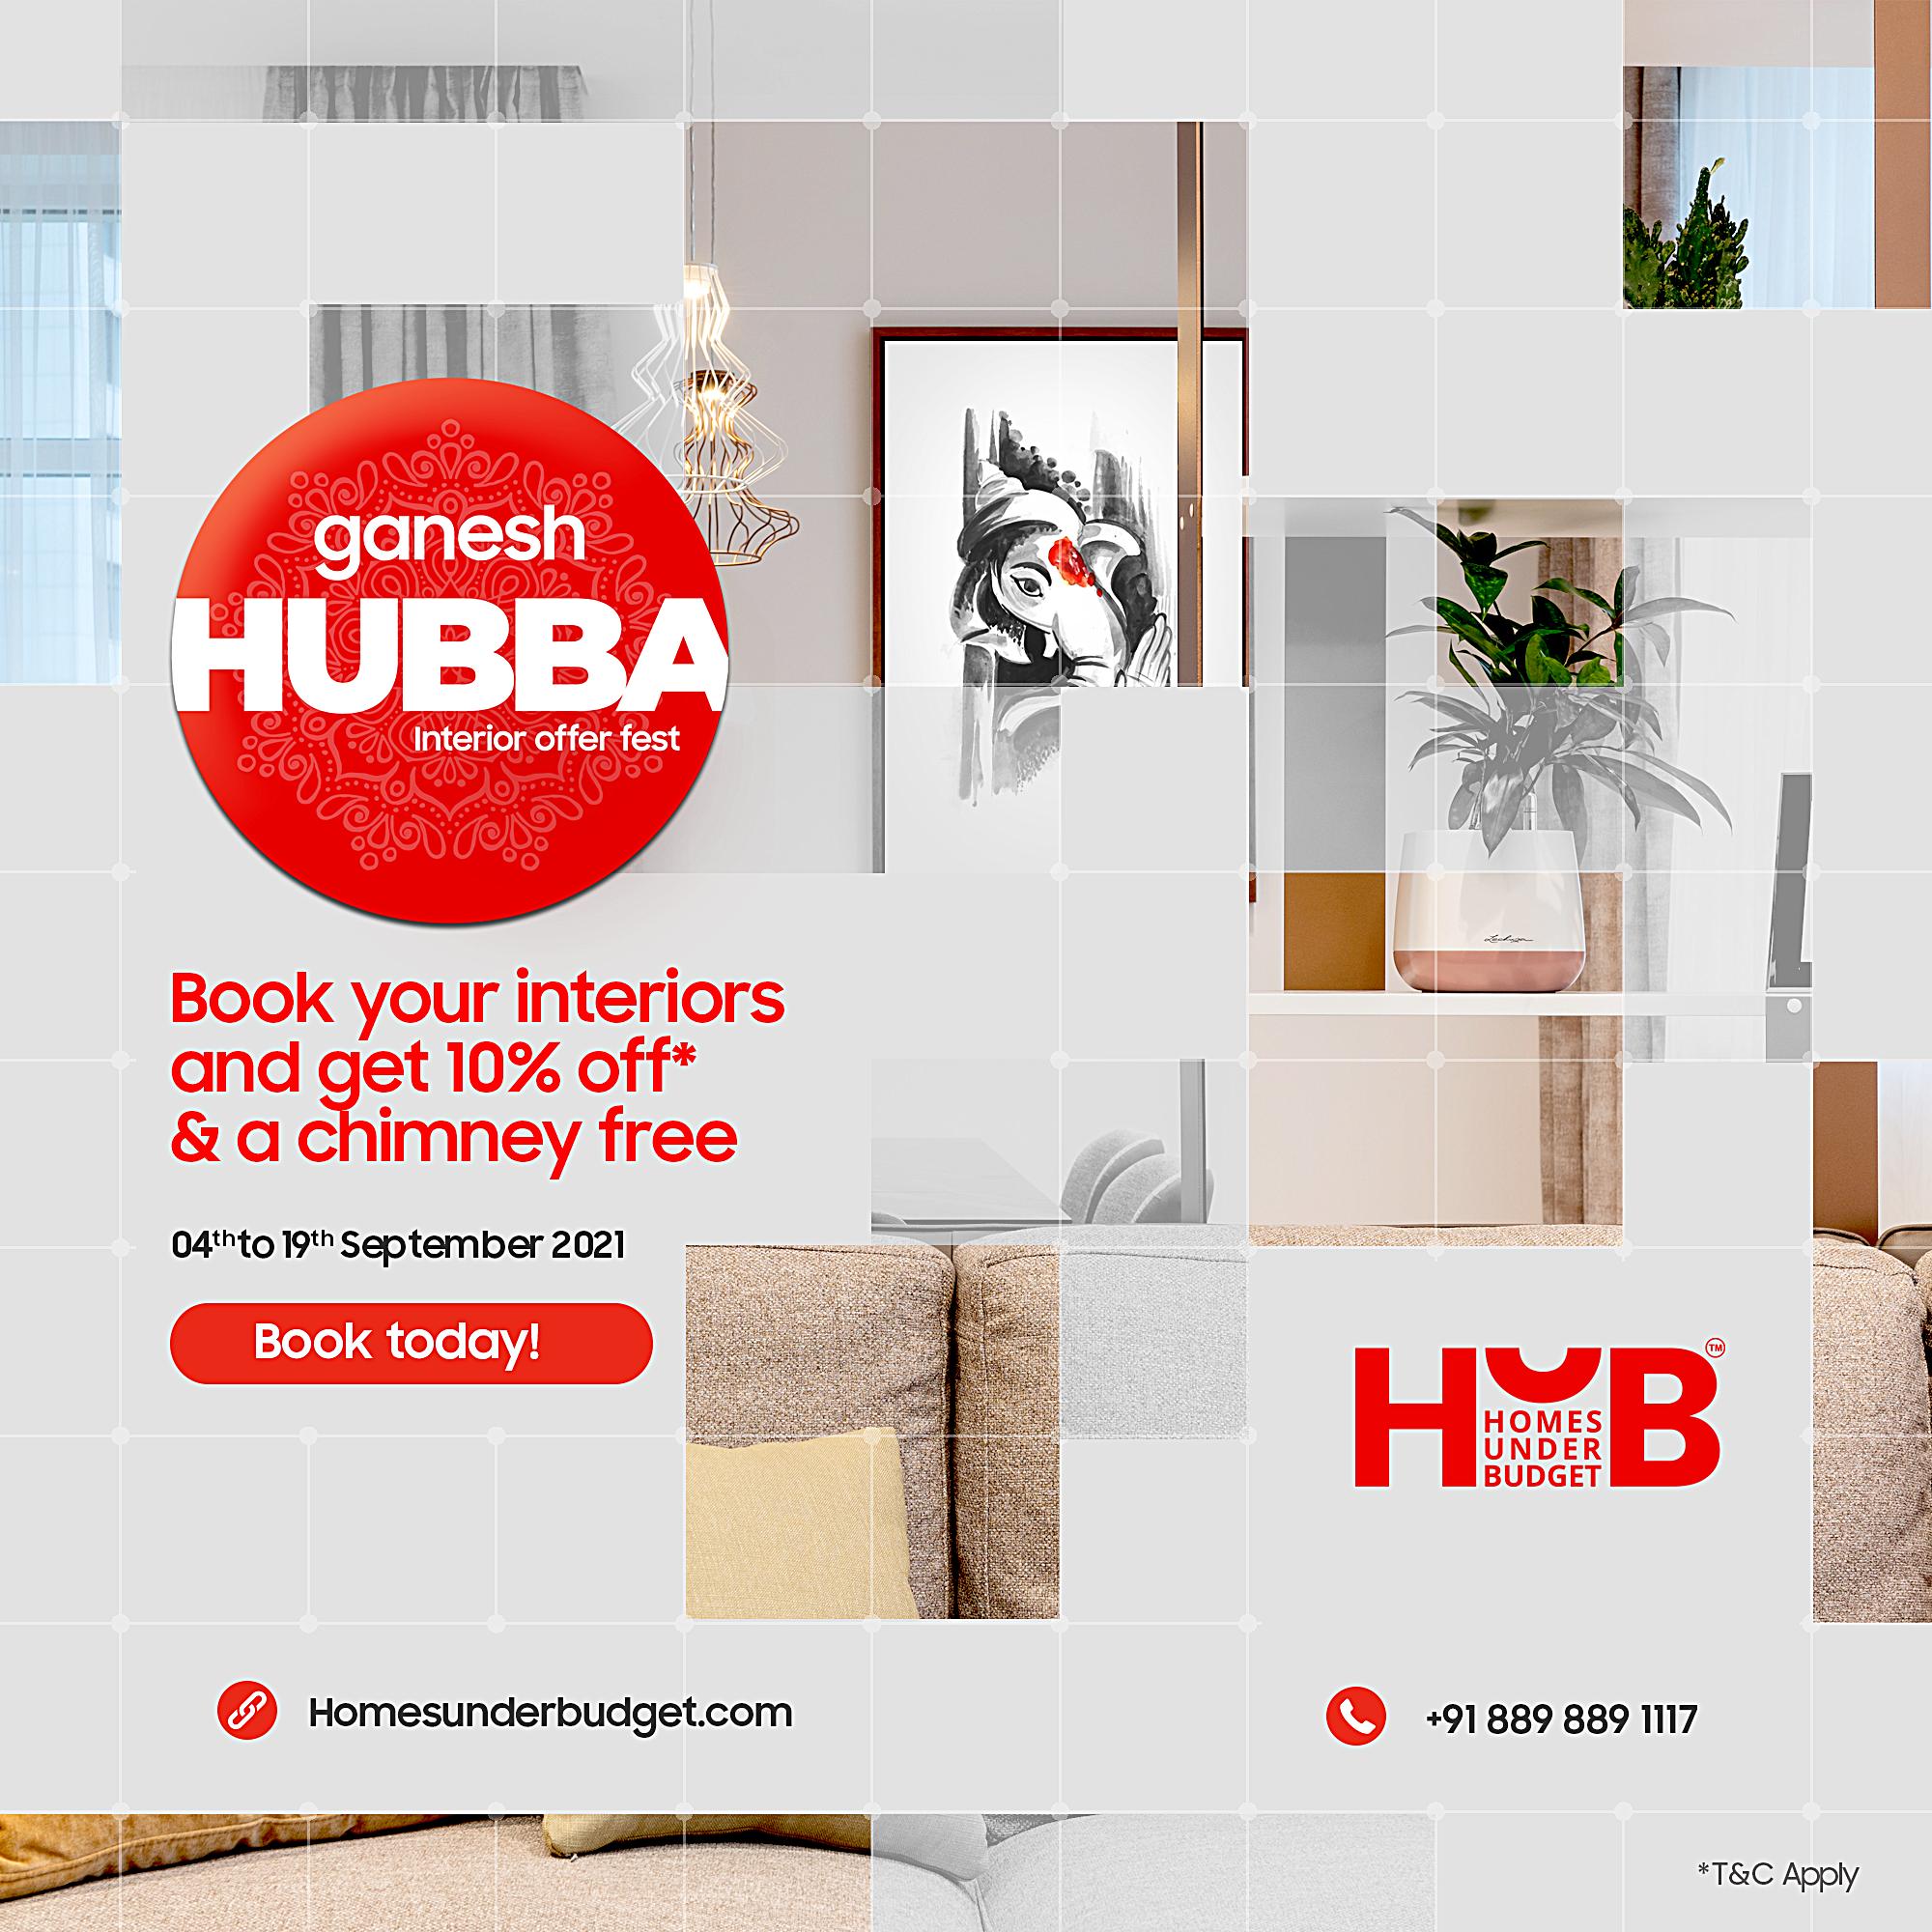 Ganesh Hubba Interior Offer